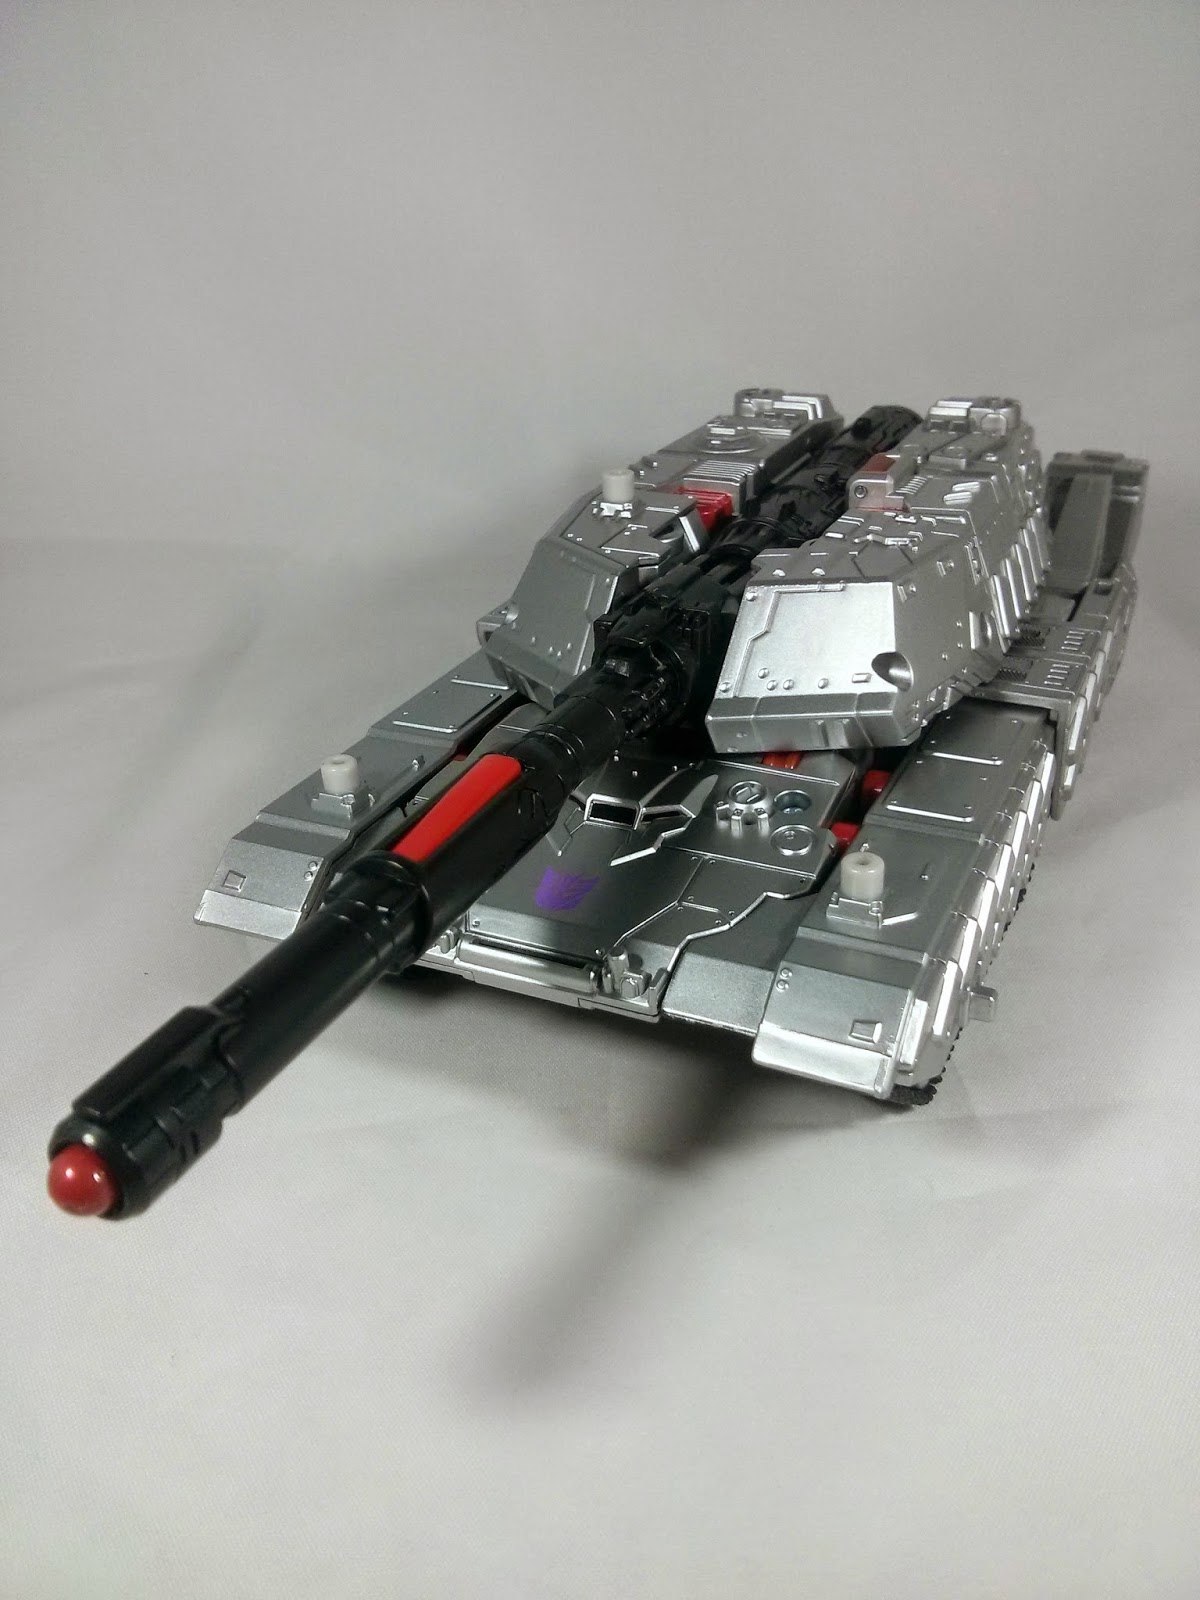 combiner wars Leader class Megatron